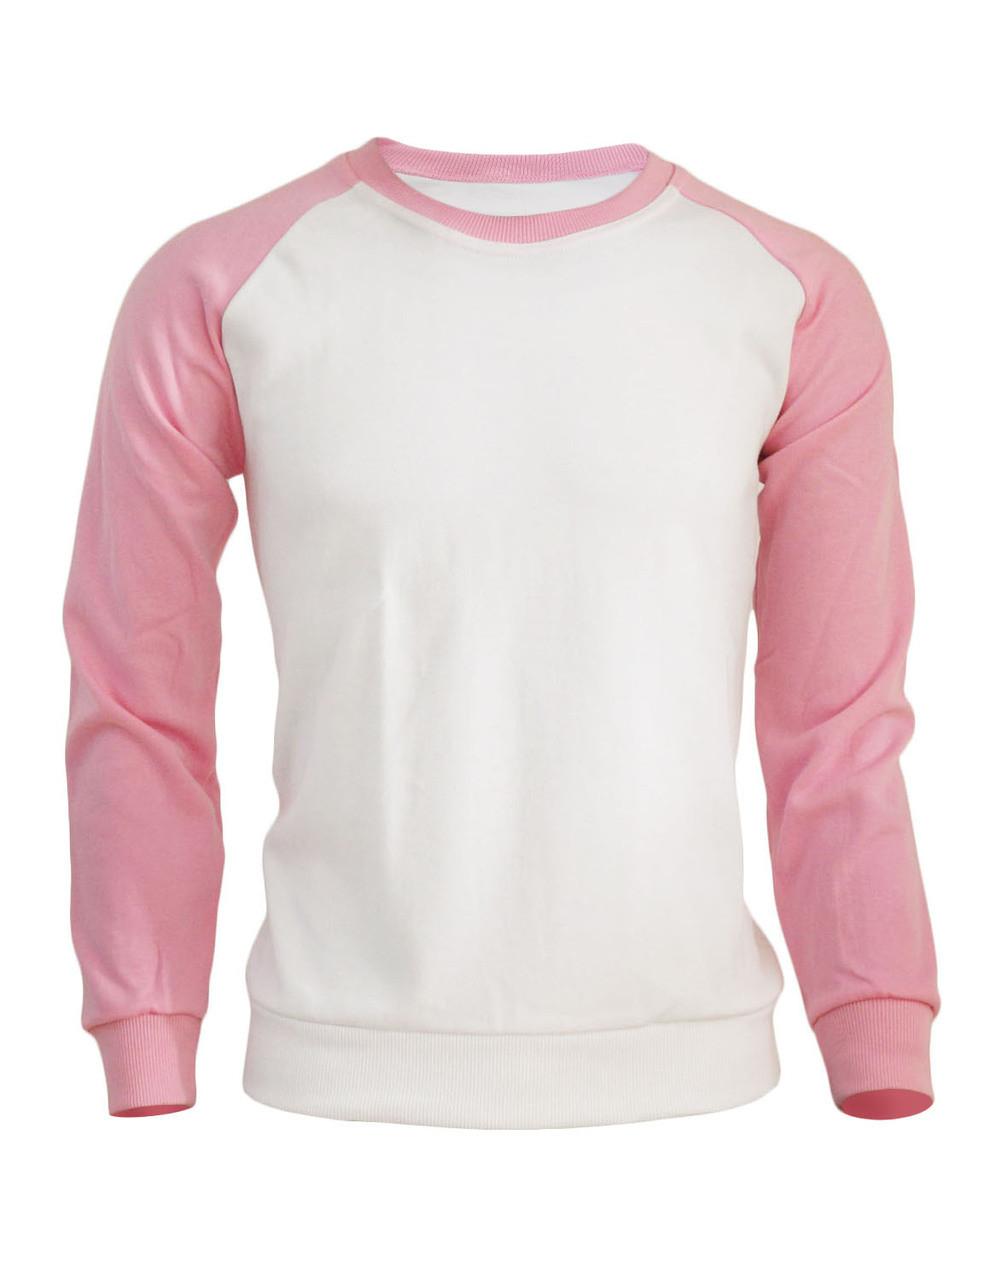 a2286aeaf21111 BCPOLO Men s Casual raglan 2 tone color t-shirt sportswear fashion crew  neck cotton shirt.